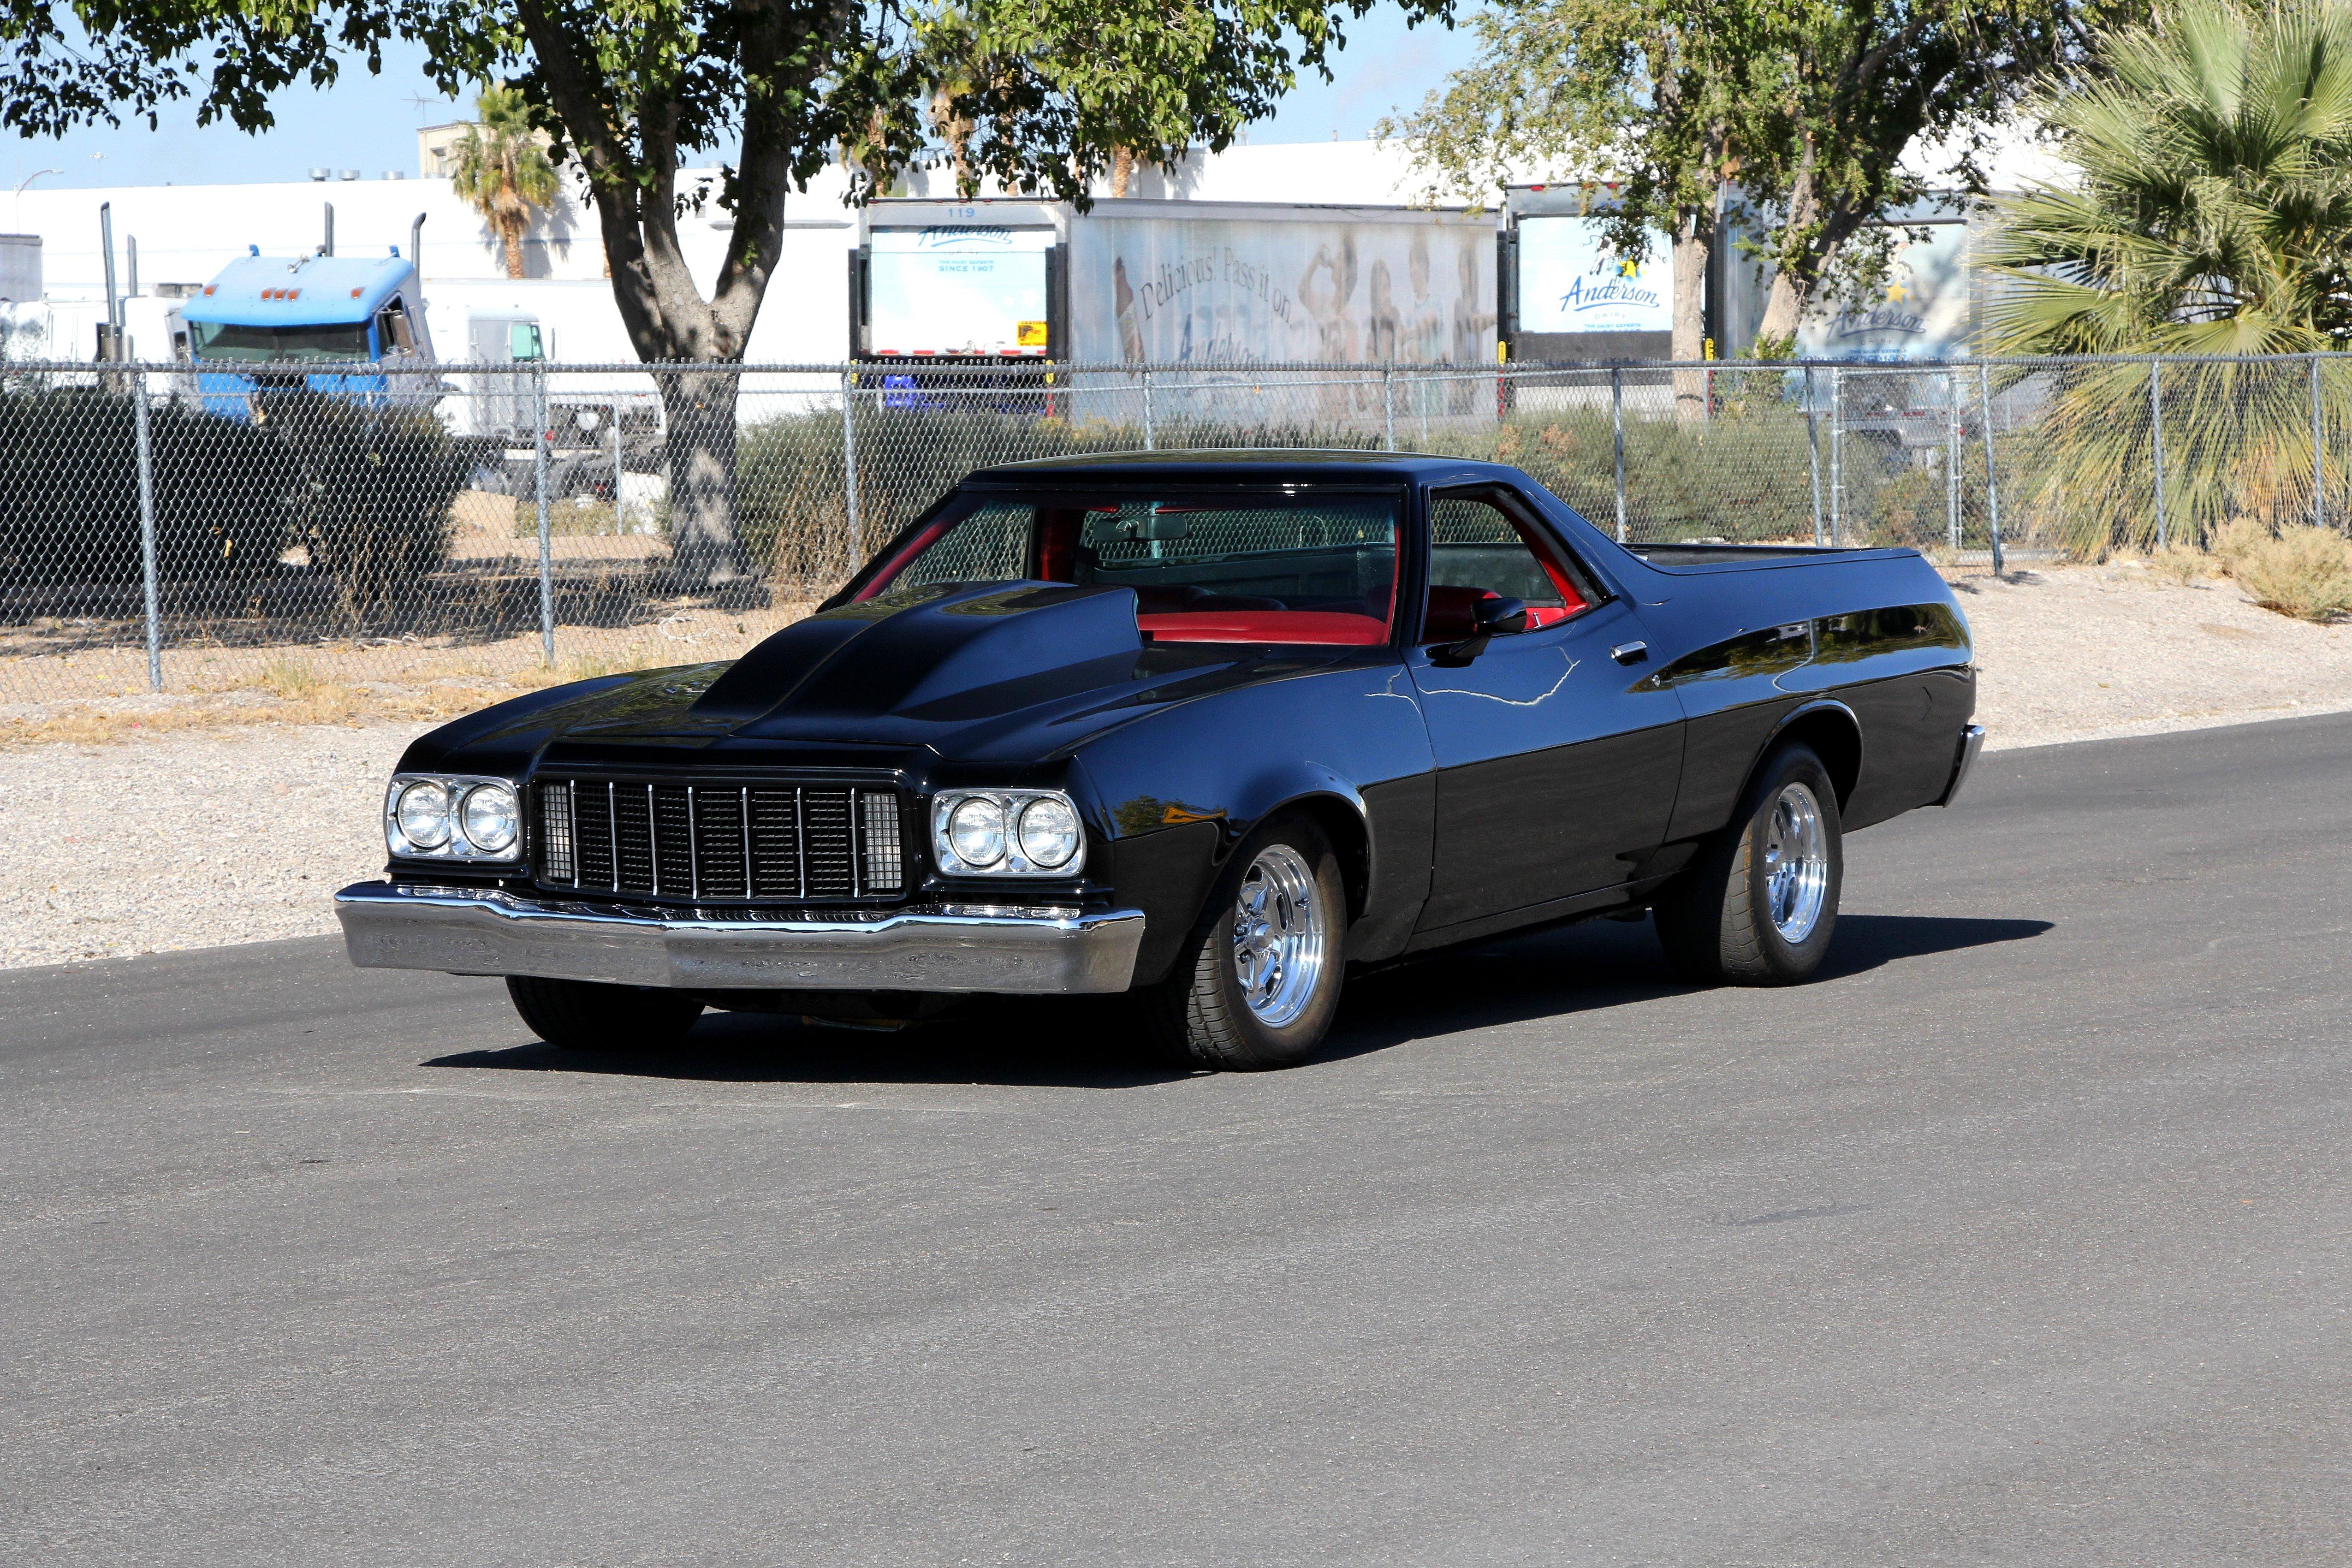 1974 Ford Ranchero Pickup Muscle Streetrod Street Rod Hot